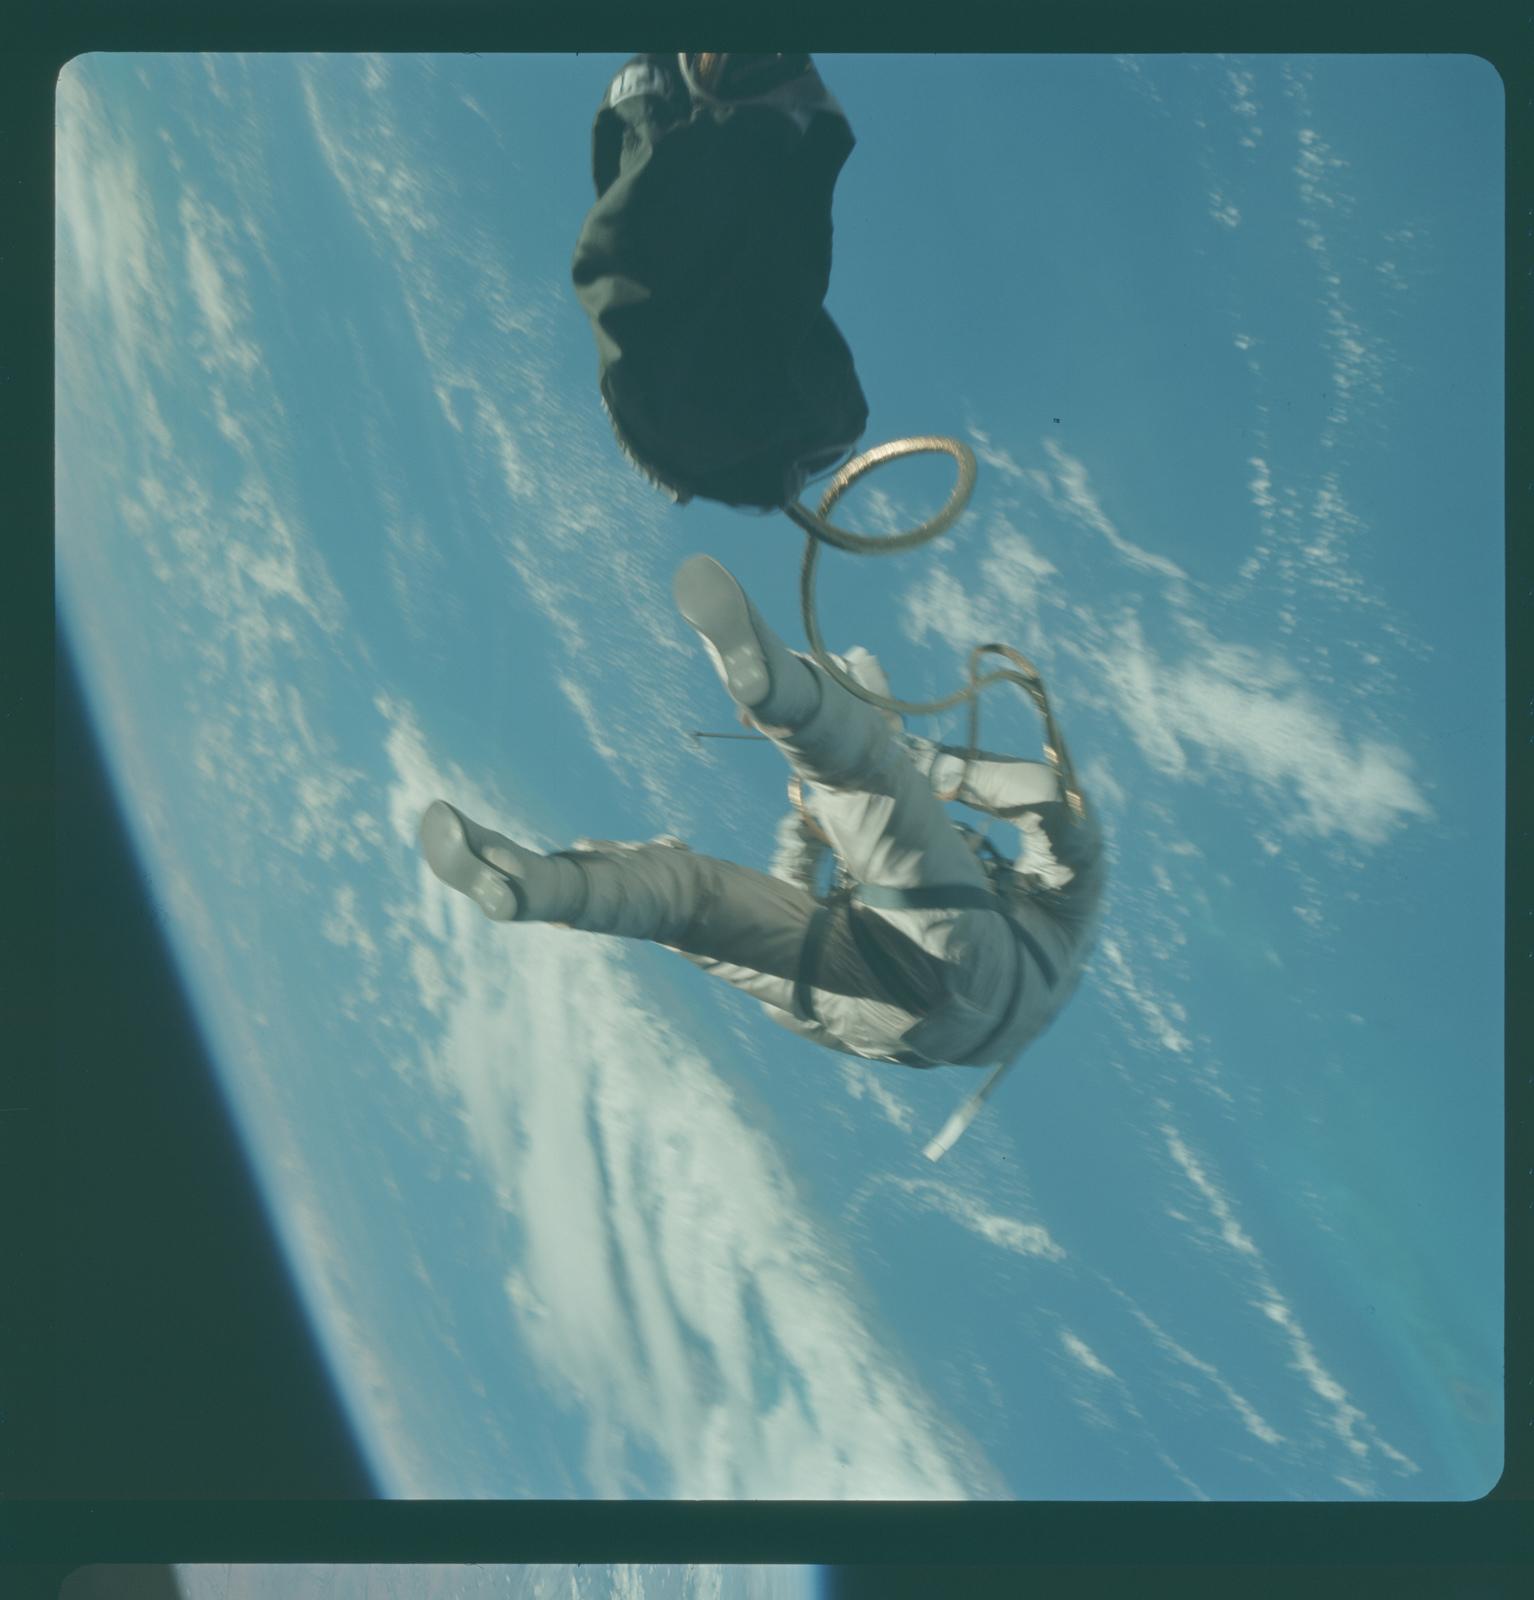 Gemini IV Mission Image - EVA over Gulf of Mexico